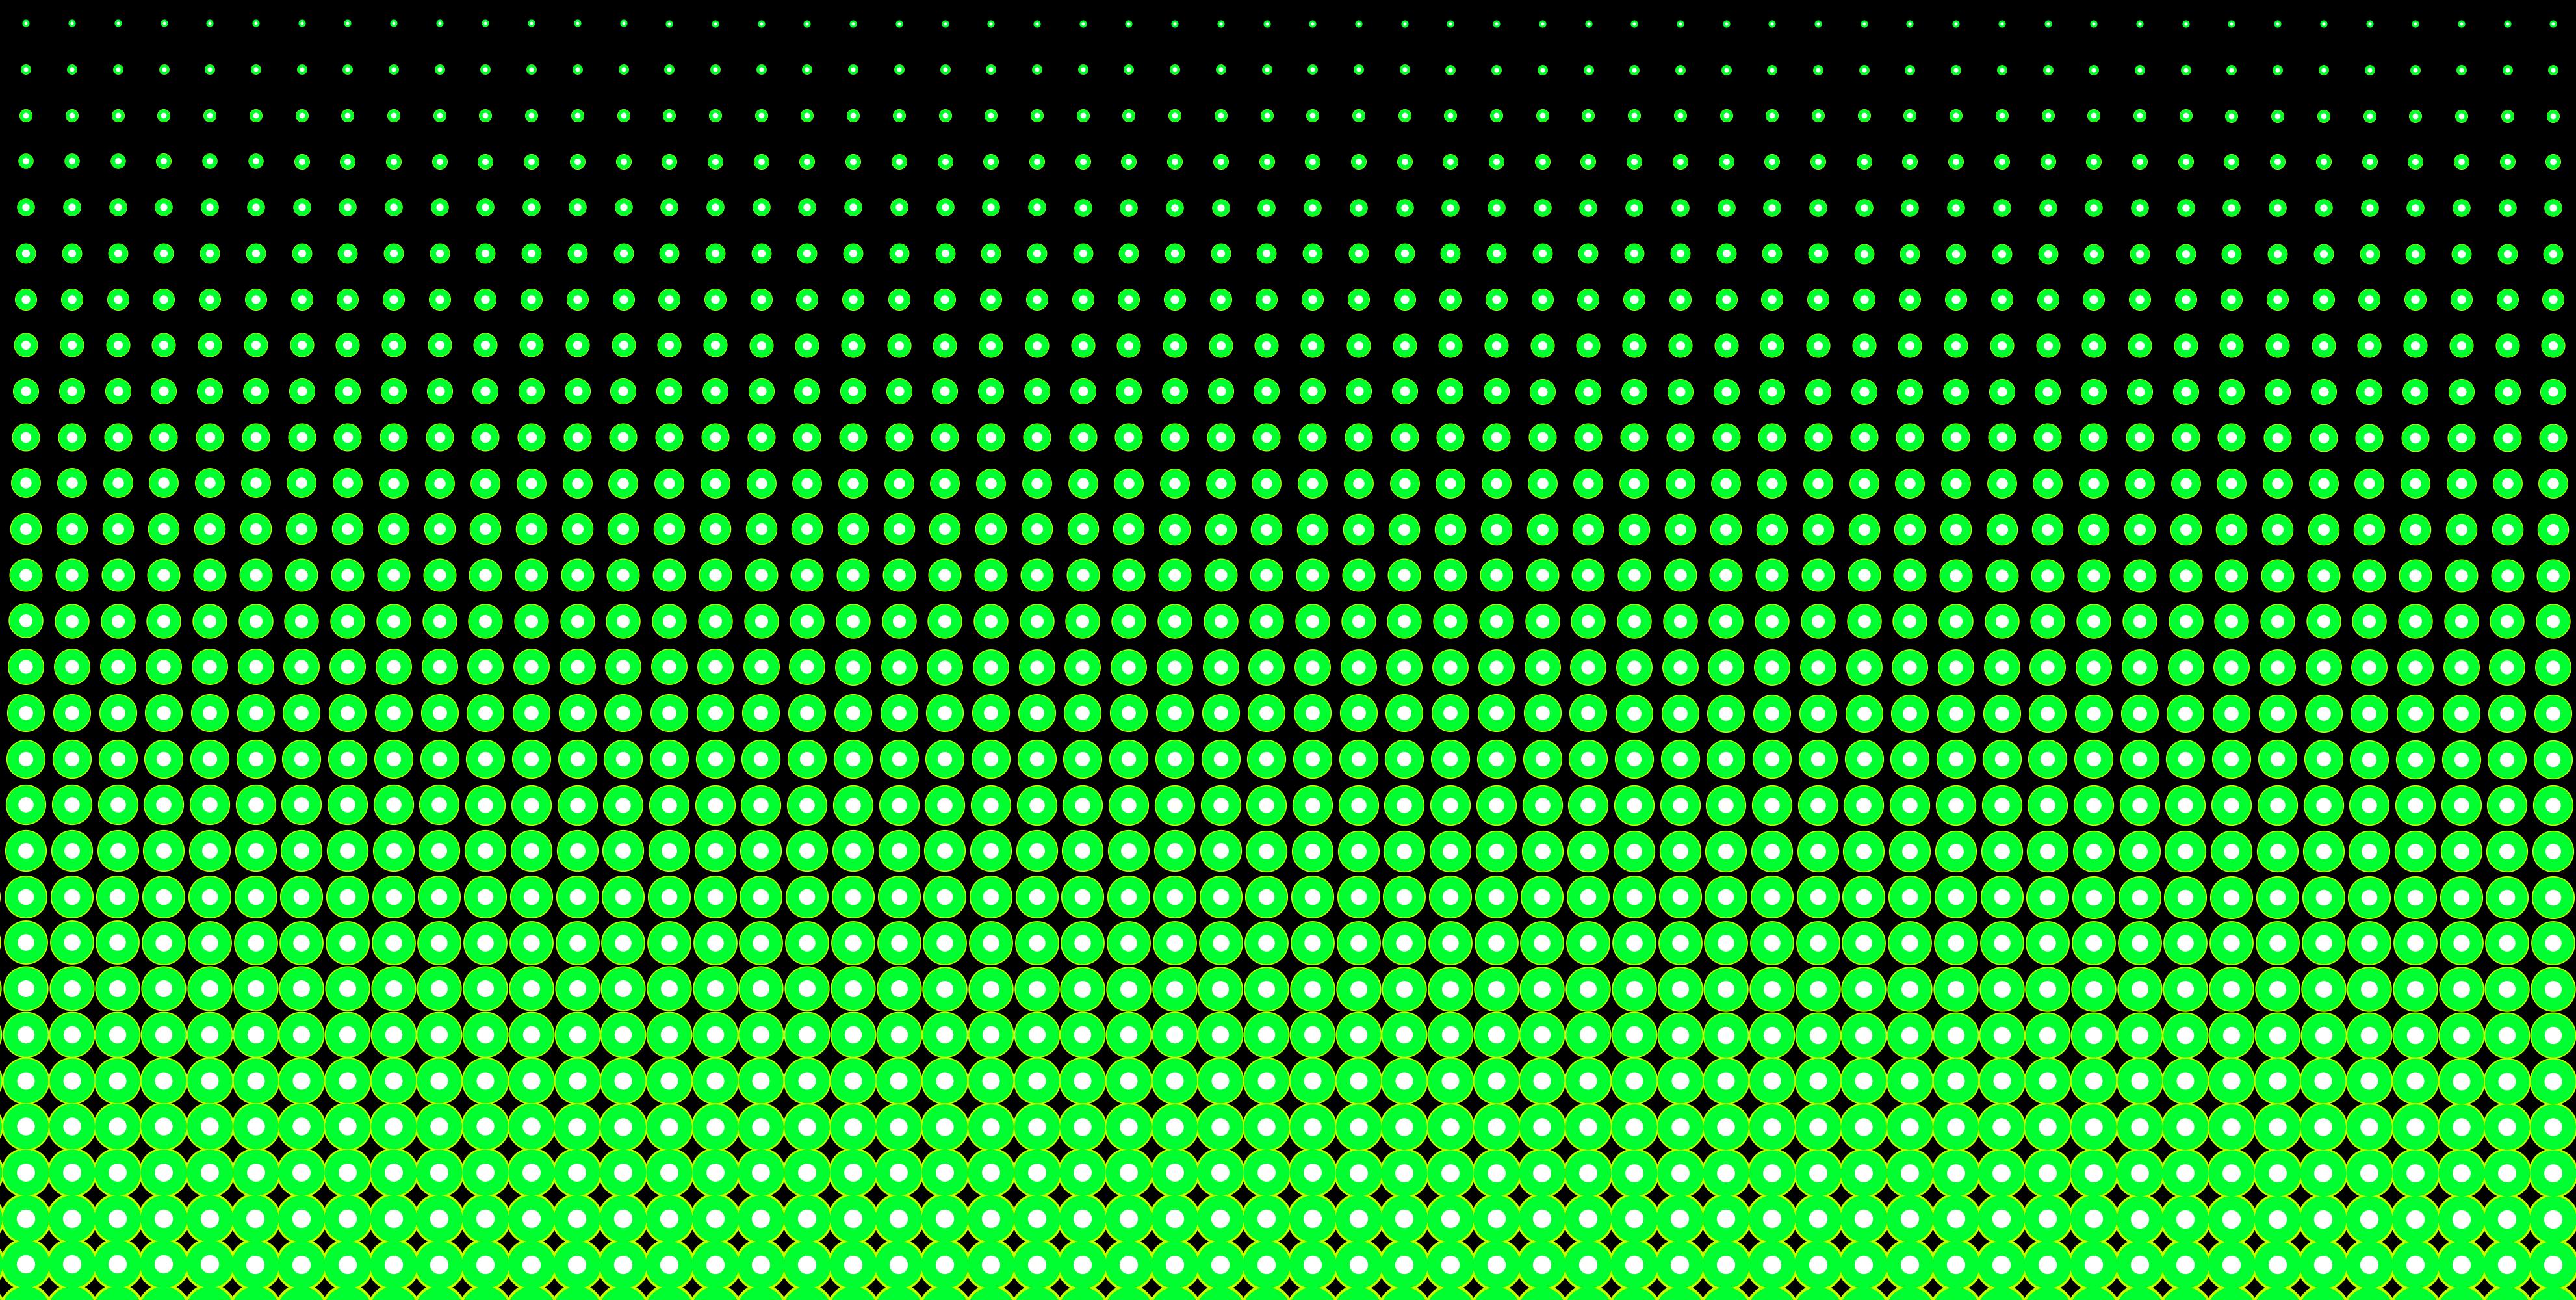 Dark green hd clipart.